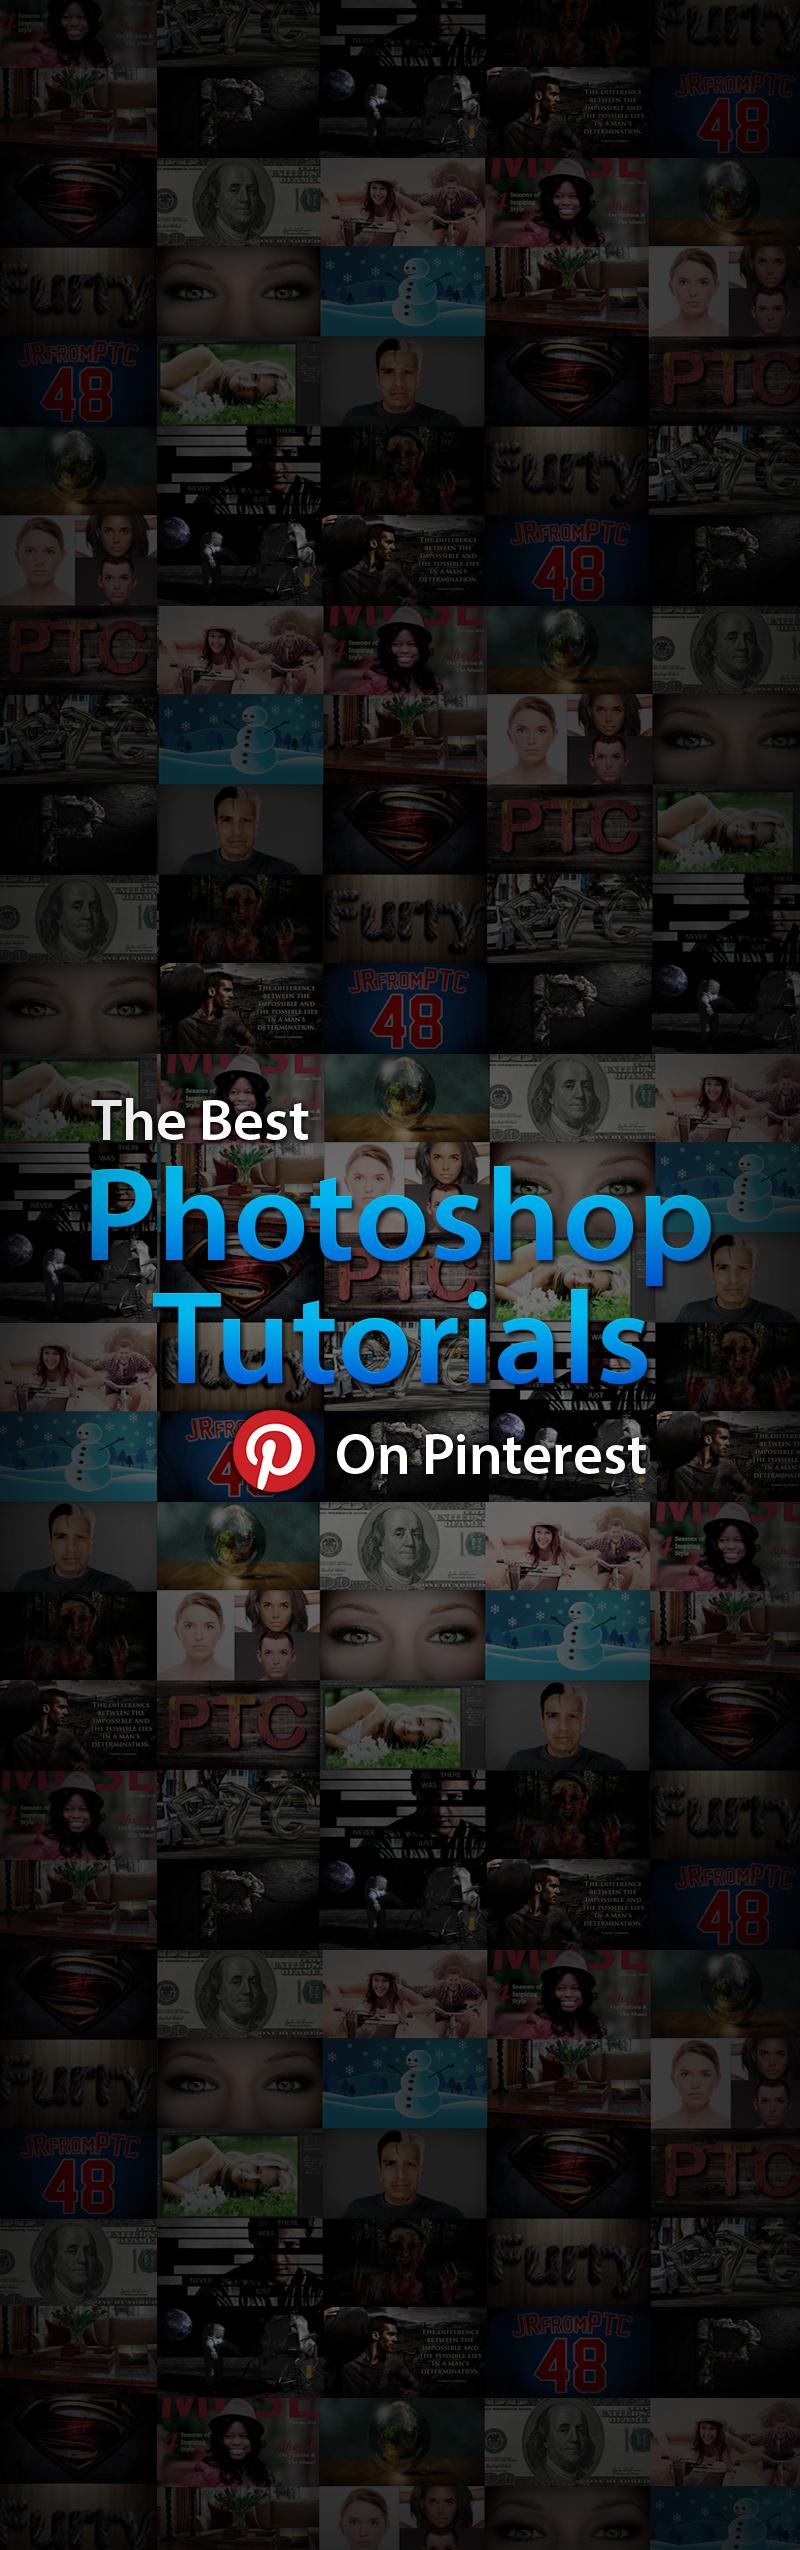 The best photoshop video tutorials on pinterest check it out the best photoshop video tutorials on pinterest check it out baditri Image collections